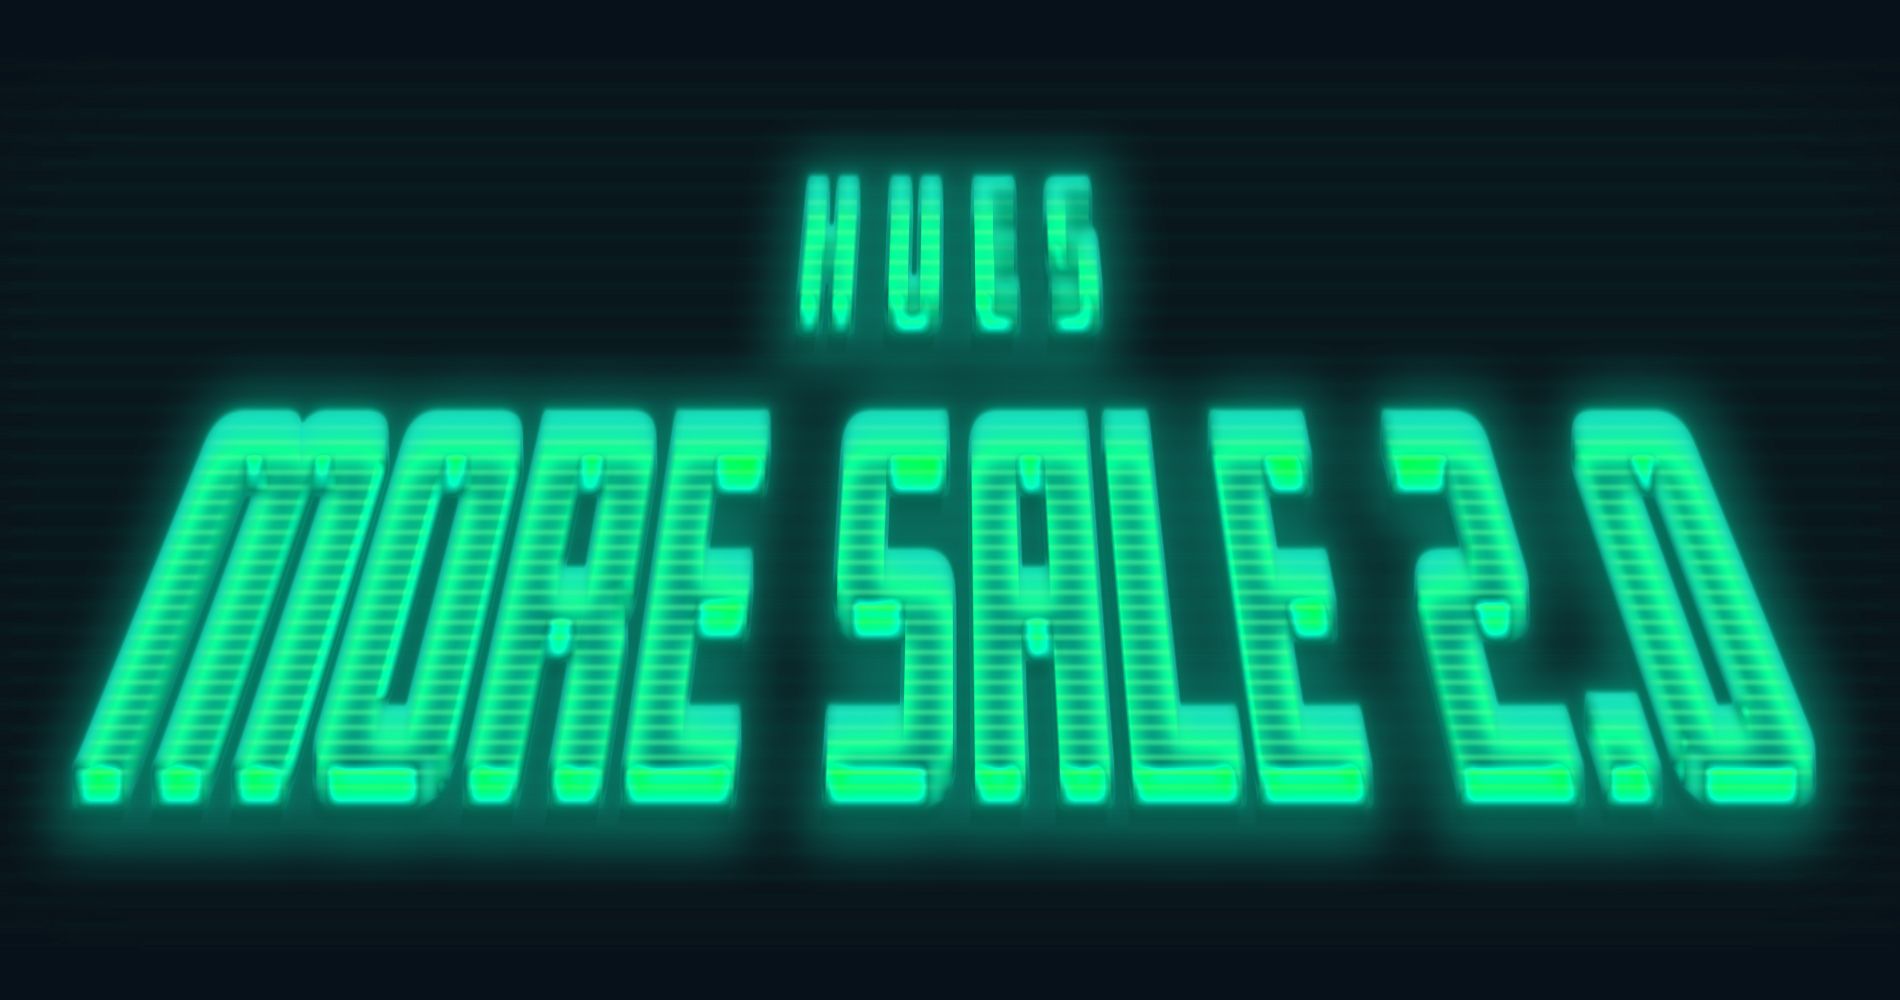 HUES MORE SALE 2.0 START !!!